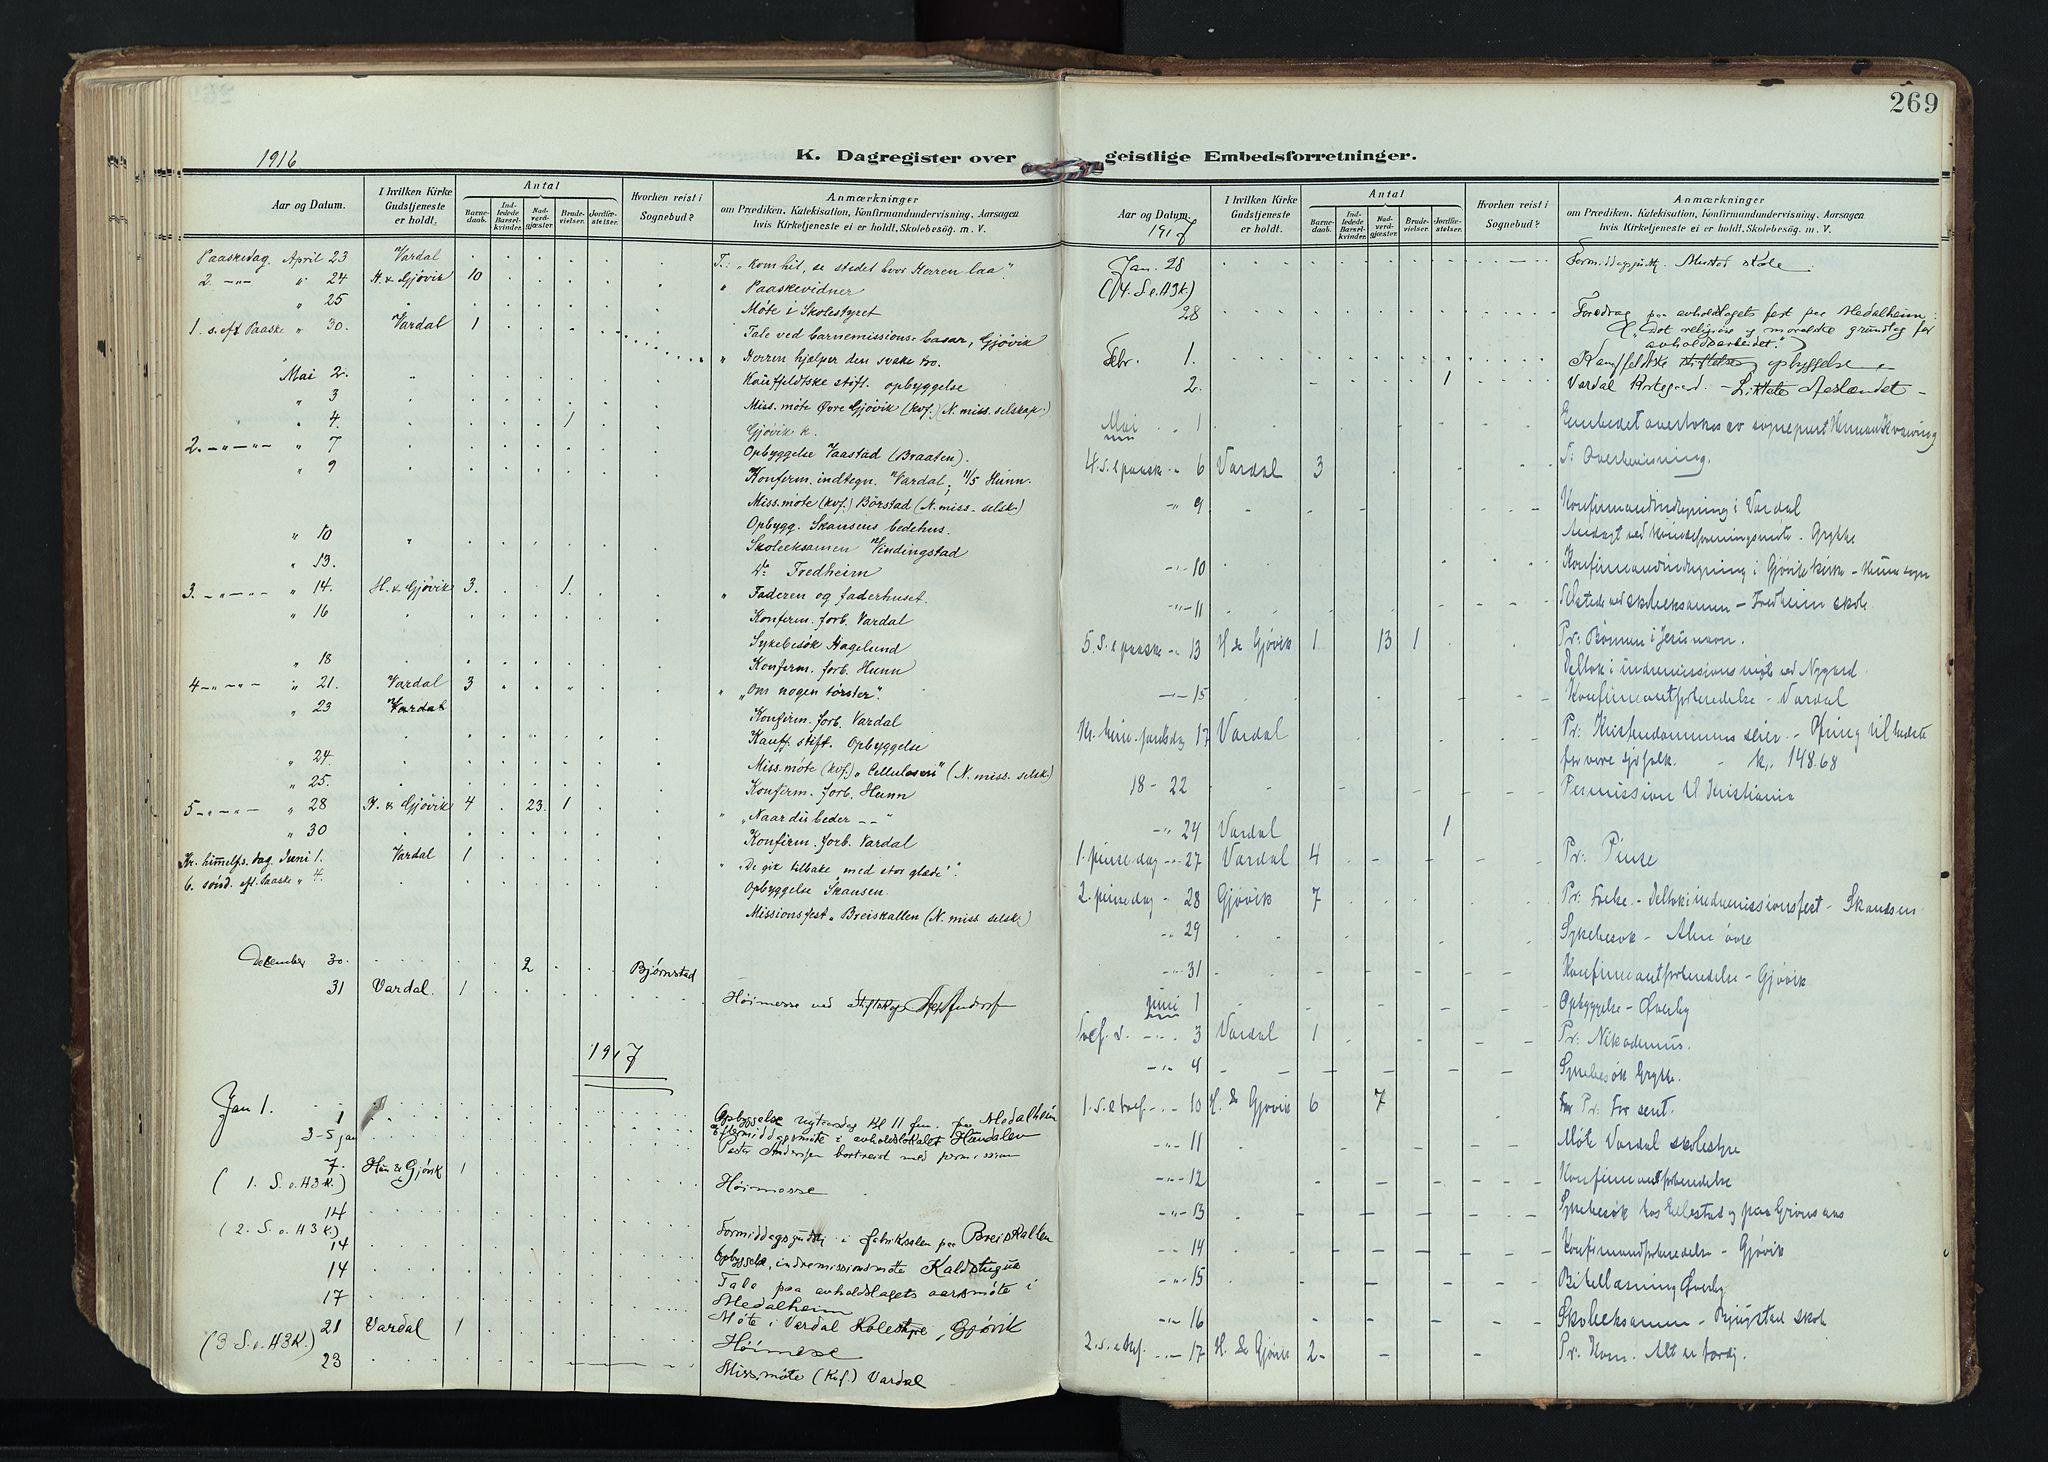 SAH, Vardal prestekontor, H/Ha/Haa/L0020: Ministerialbok nr. 20, 1907-1921, s. 269